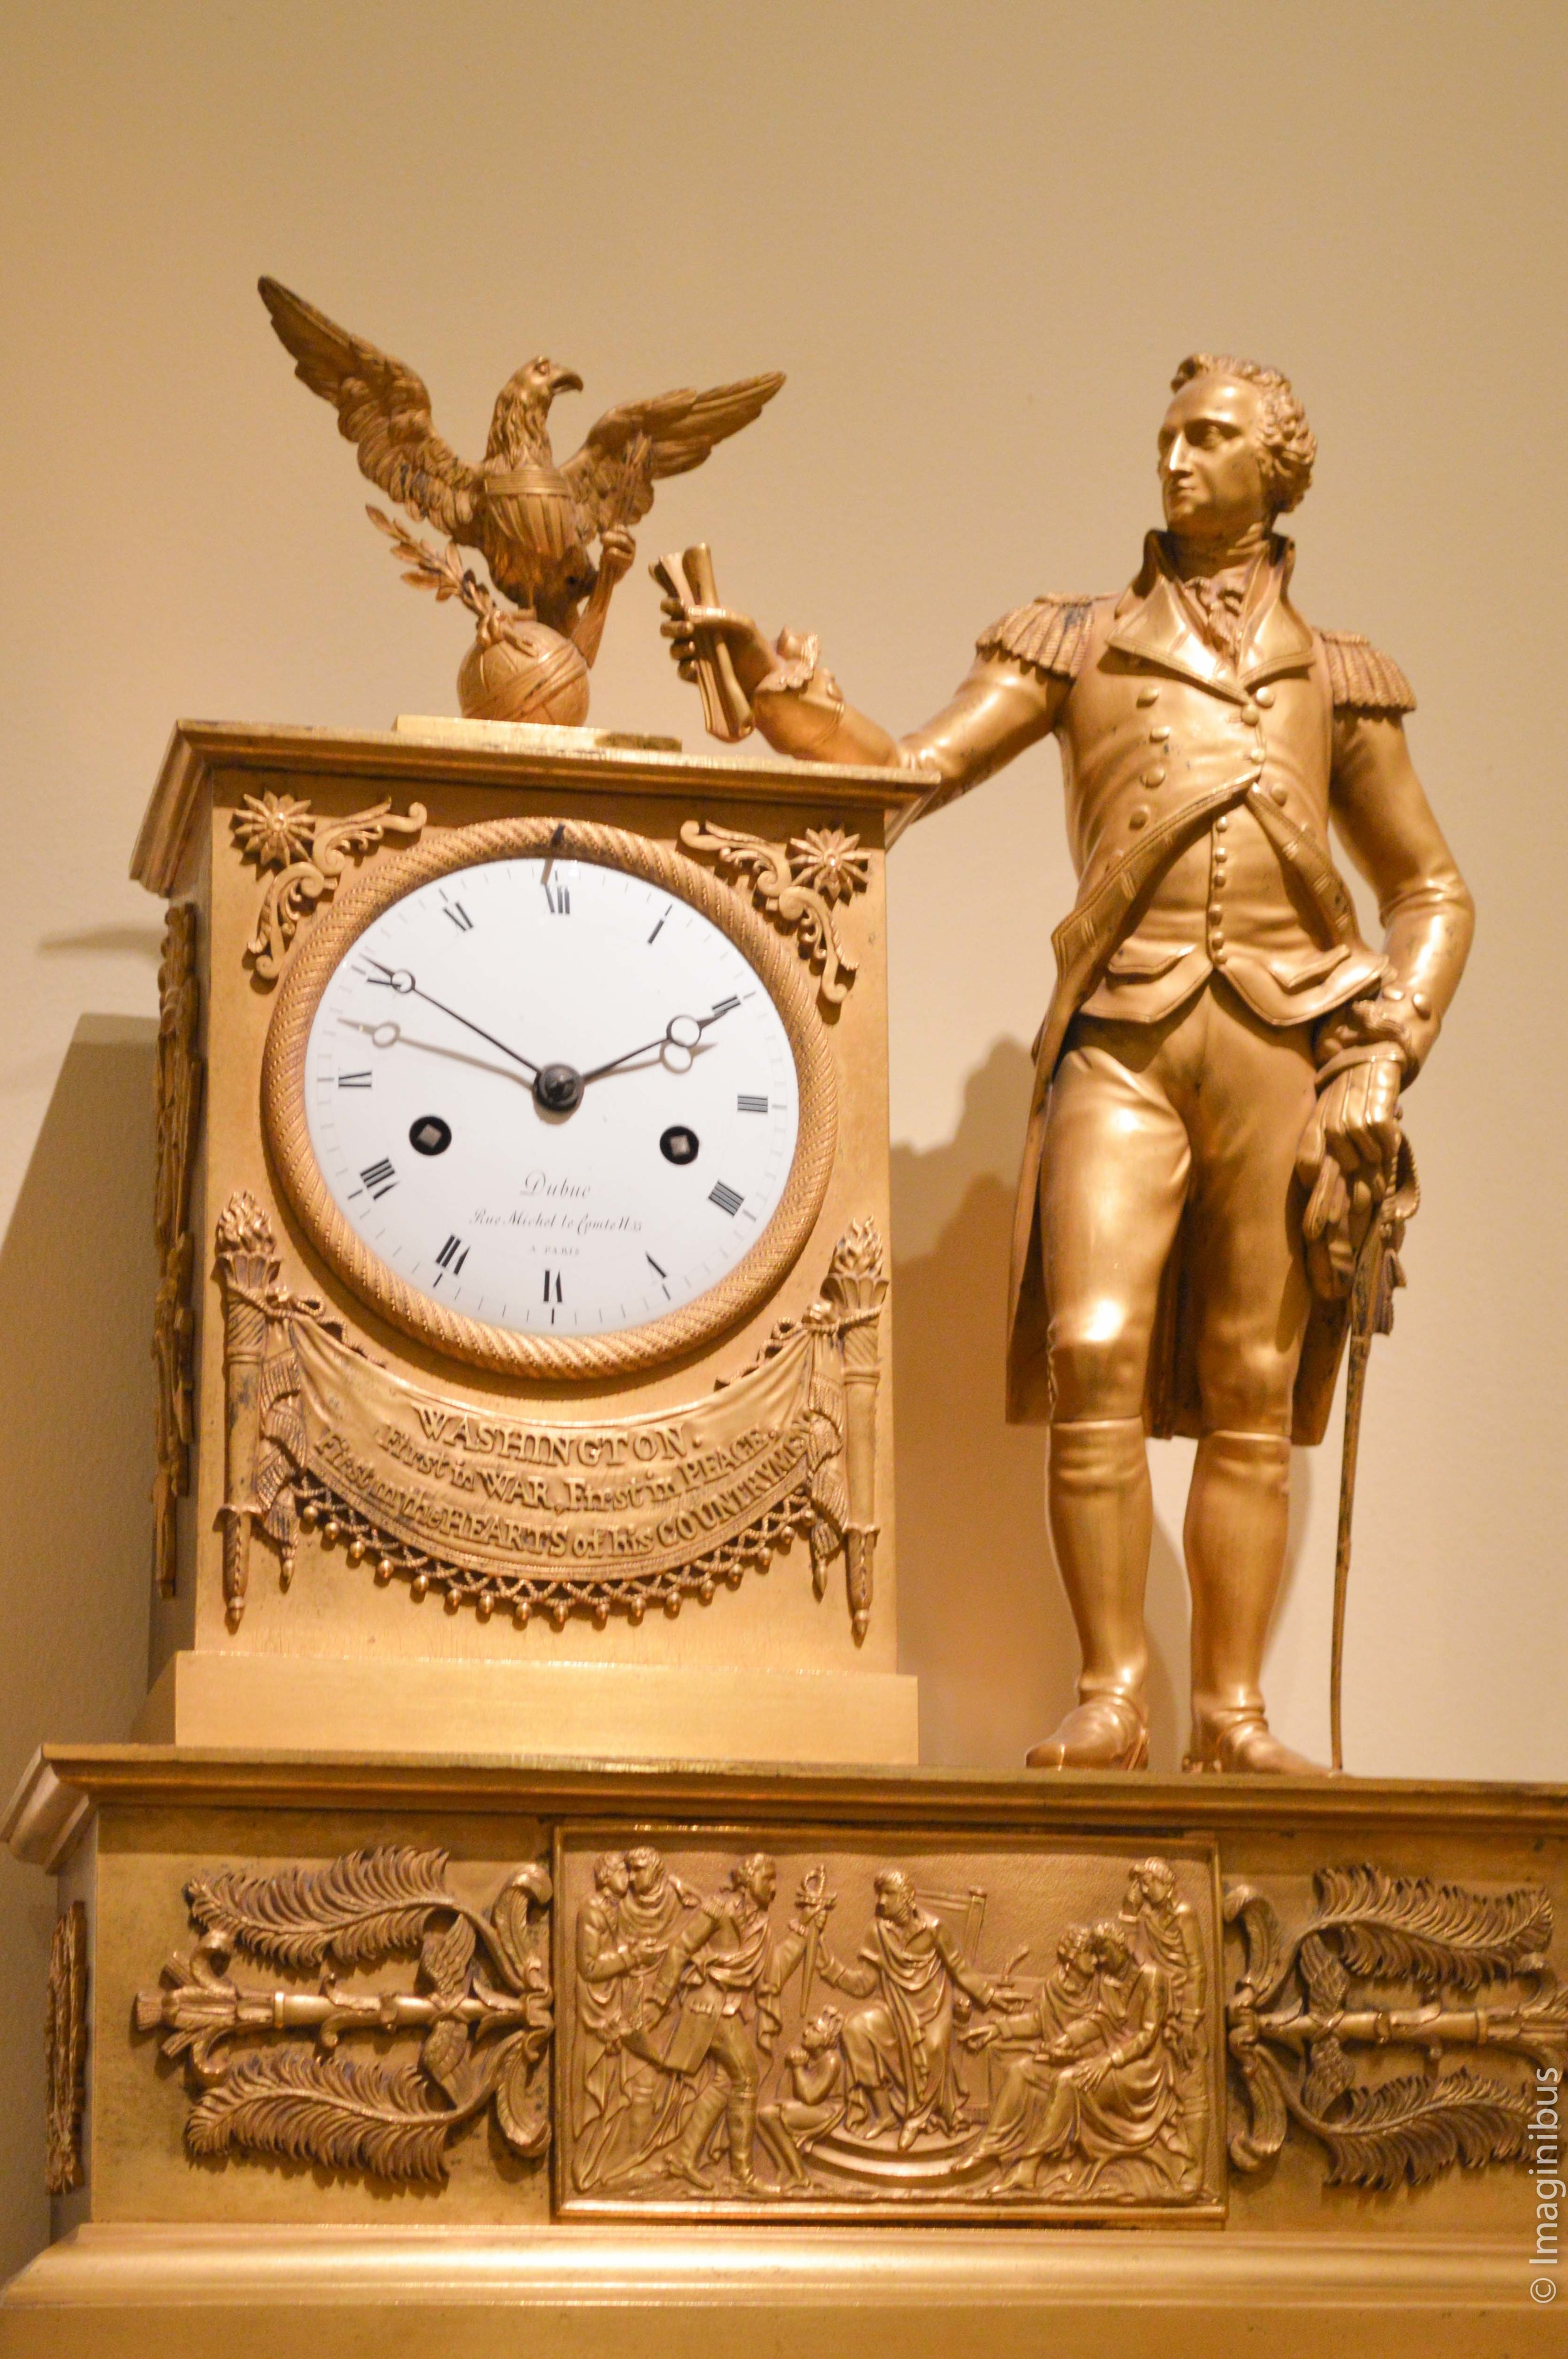 George Washington Clock, Metropolitan Museum of Art